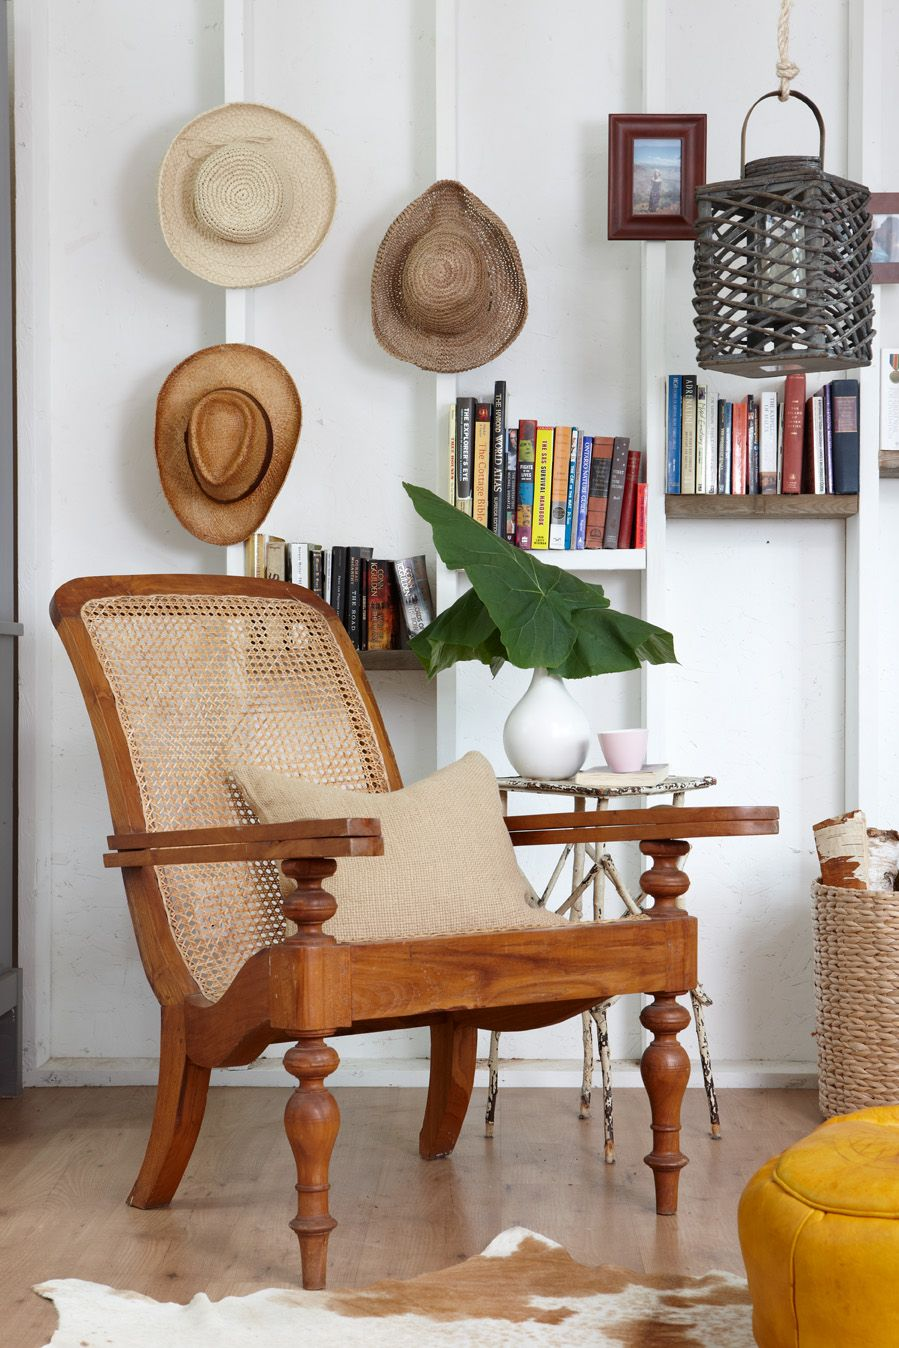 Sam Sacks Design is a boutique interior design shop located in